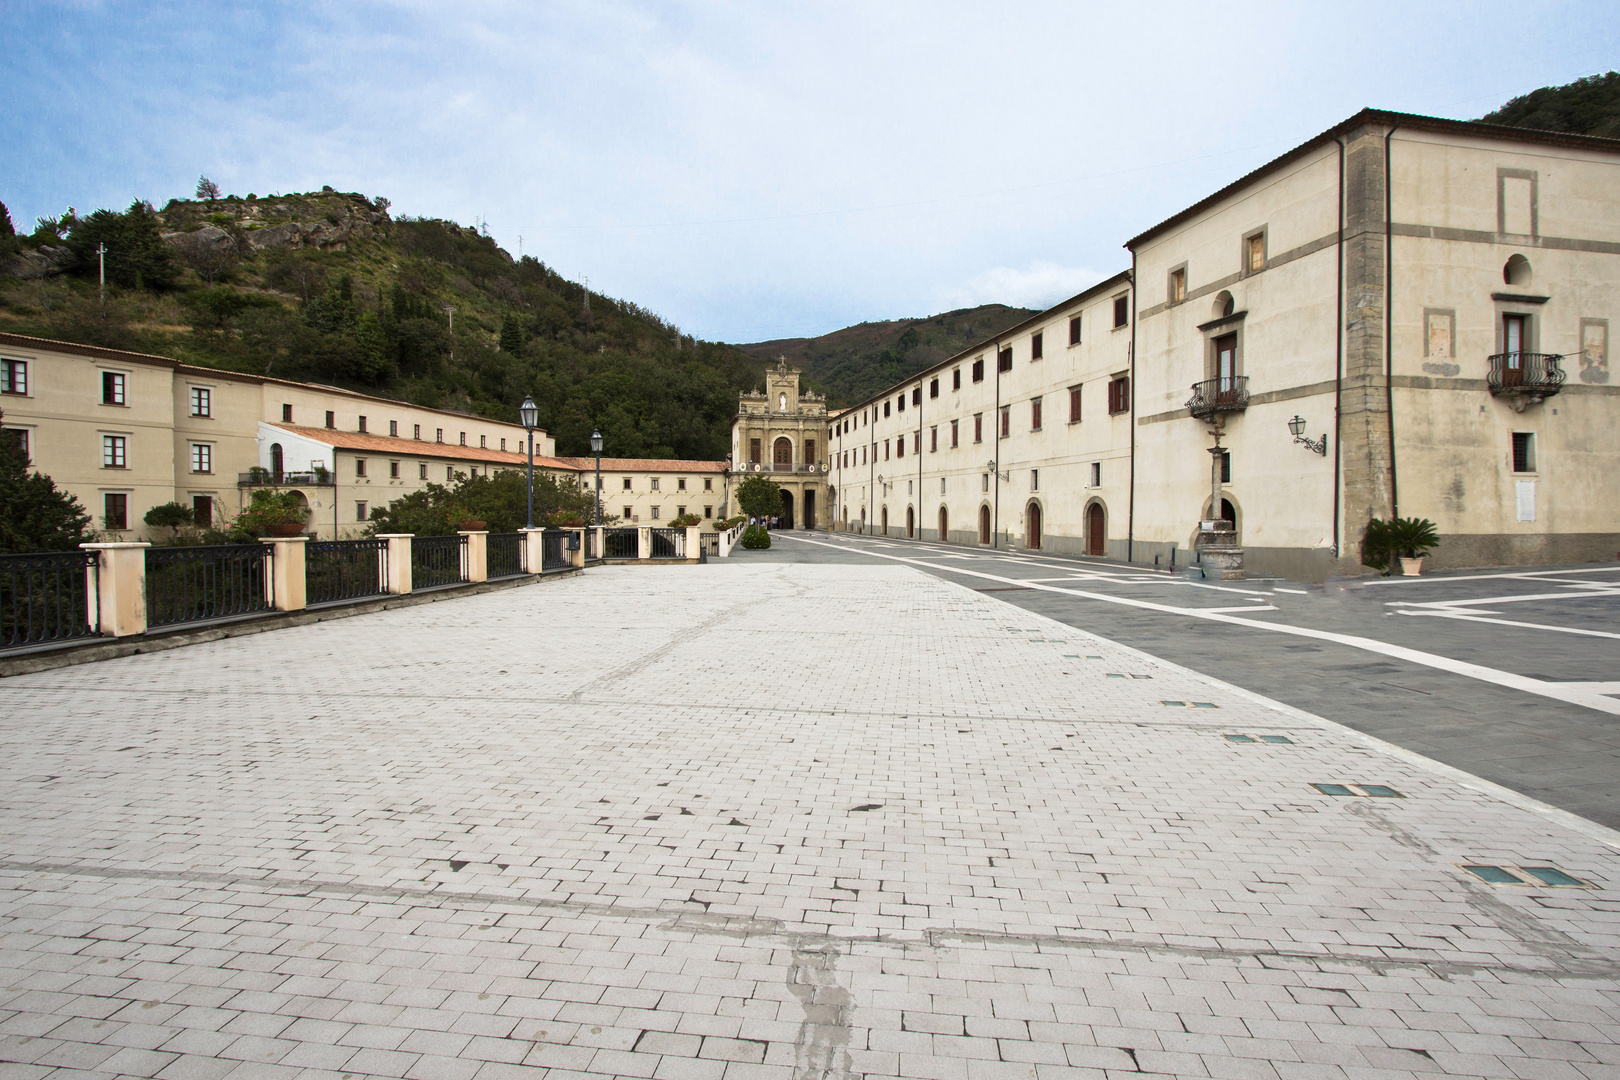 Kloster - Santuario di San Francesco di Paola